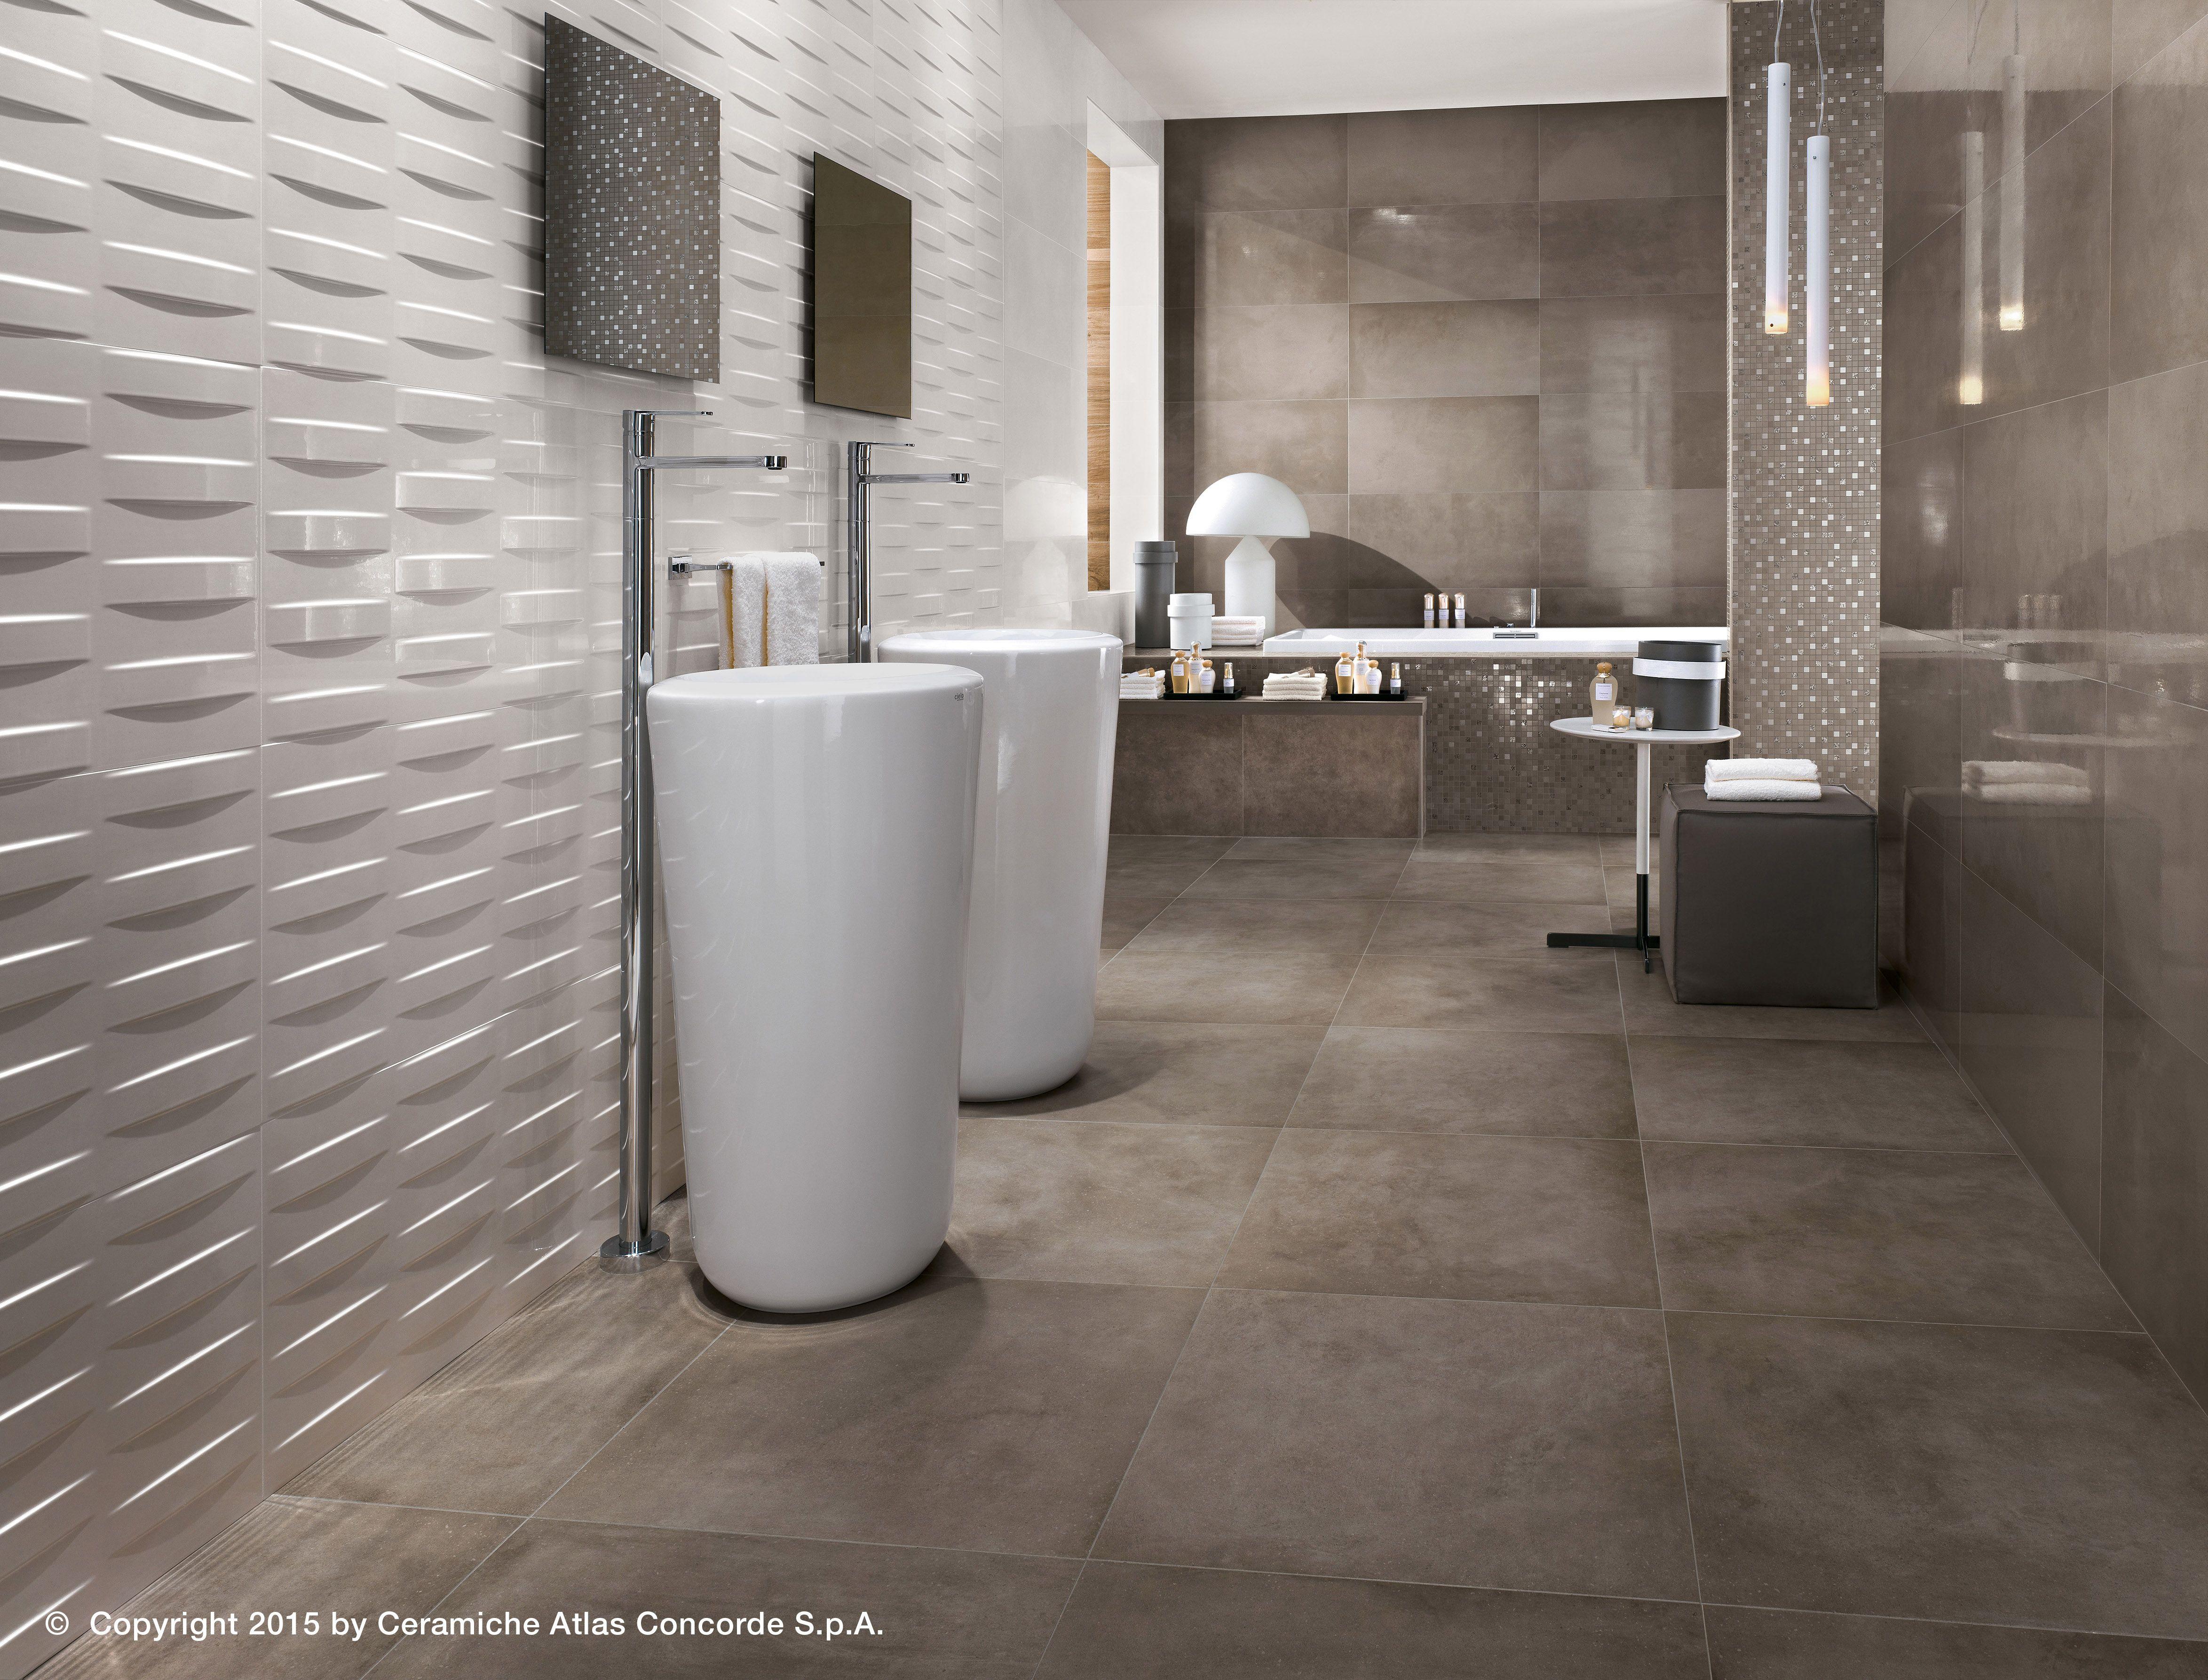 Resin bathroom floor - Dwell Wall Design Colecci N Revestimientos En Pasta Blanca By Atlas Concorde Atlasporcelain Floorconcordebath Roomwall Designpowder Roomsmail Resinproducts